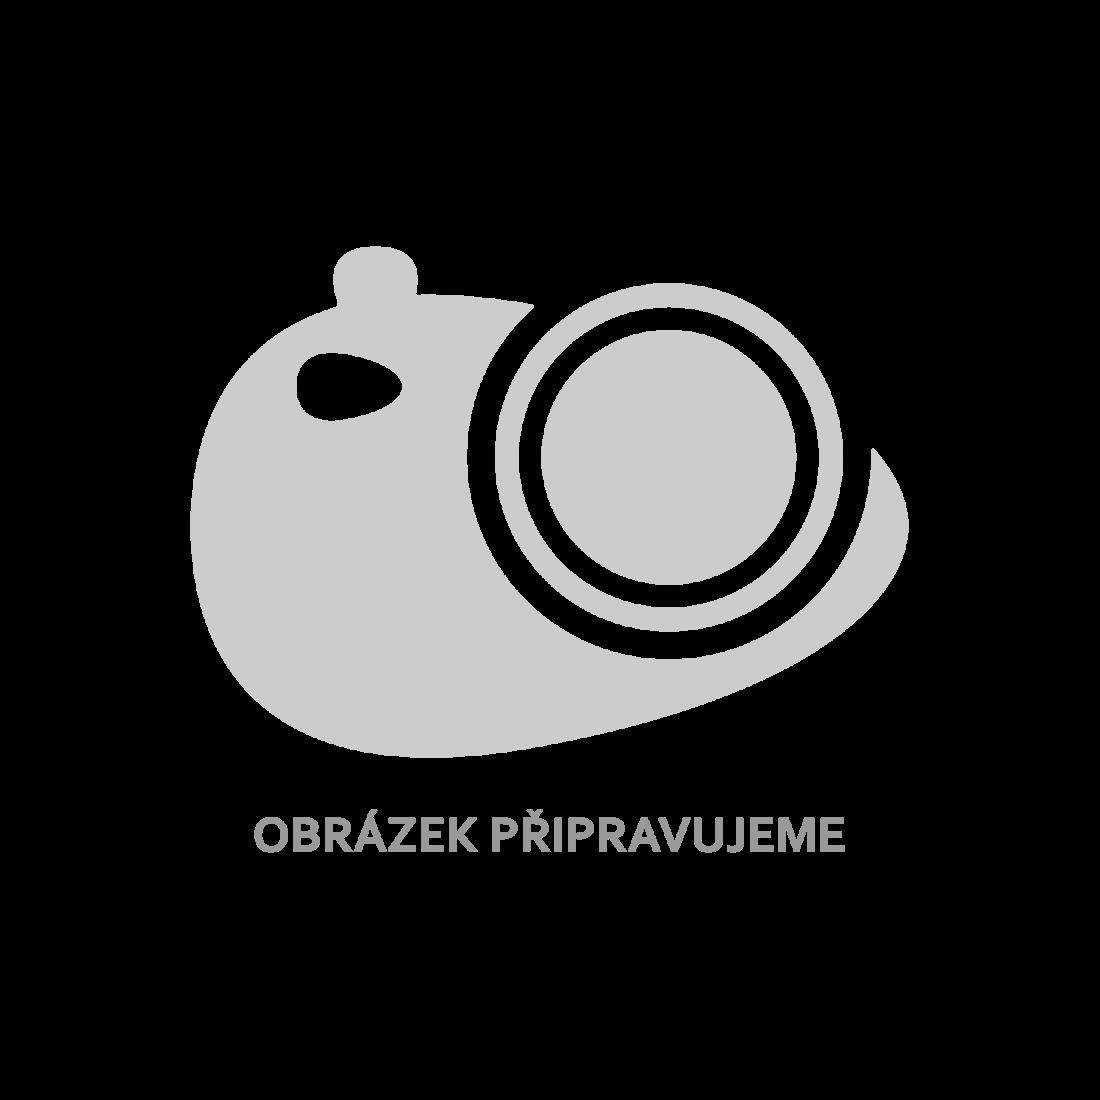 vidaXL Ručně pletený sedací puf modro-bílý 50 x 35 cm bavlna [287597]